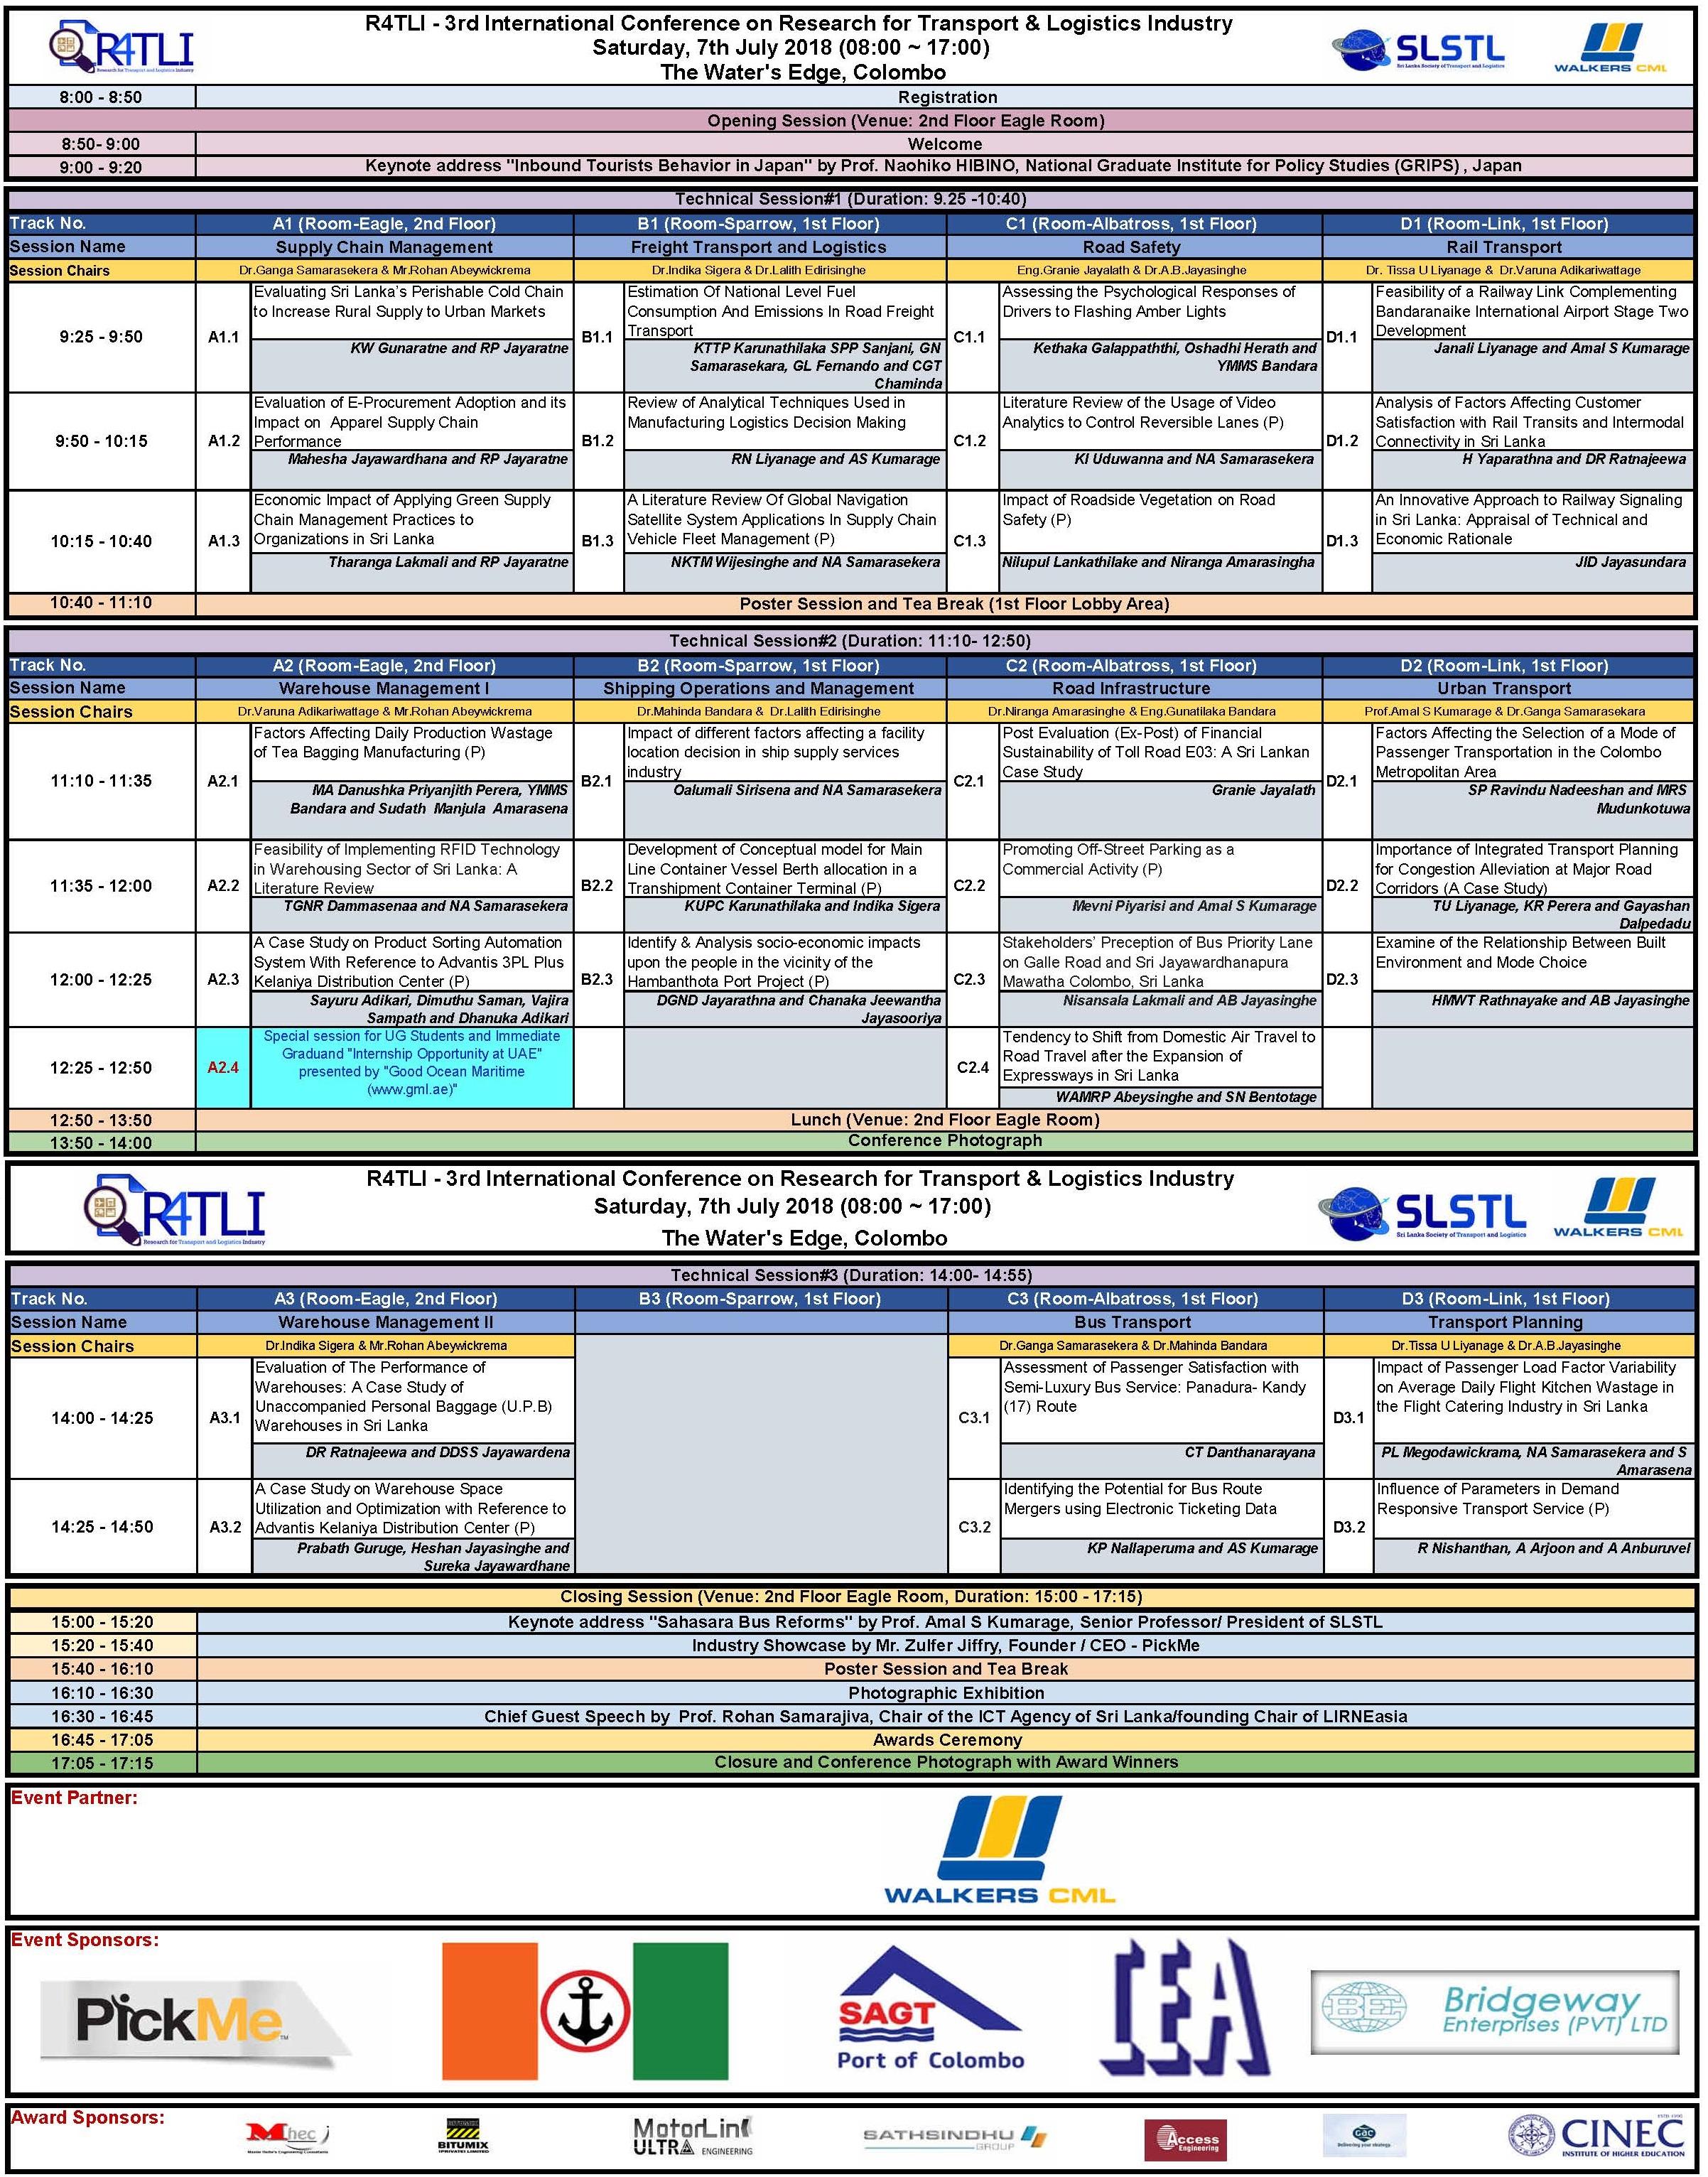 2018.07.06 _Conference Program - R4TLI 2018 Final